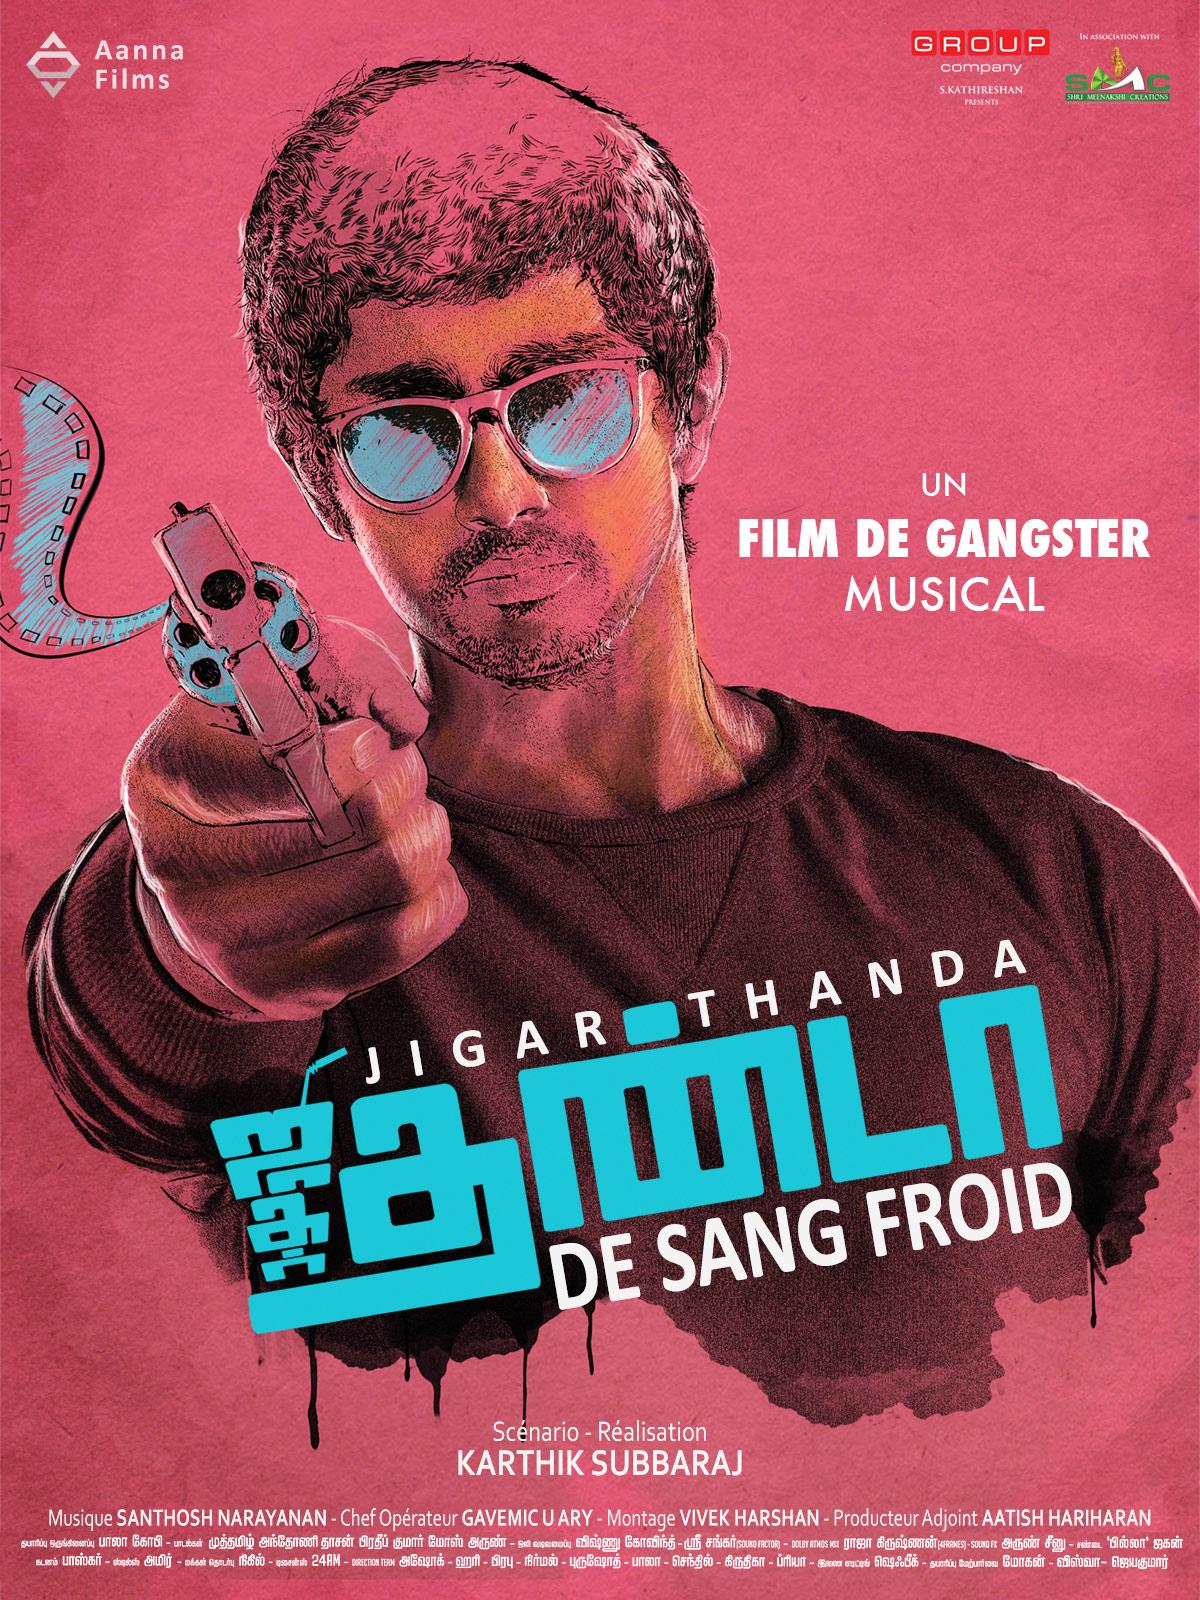 Jigarthanda - De Sang Froid